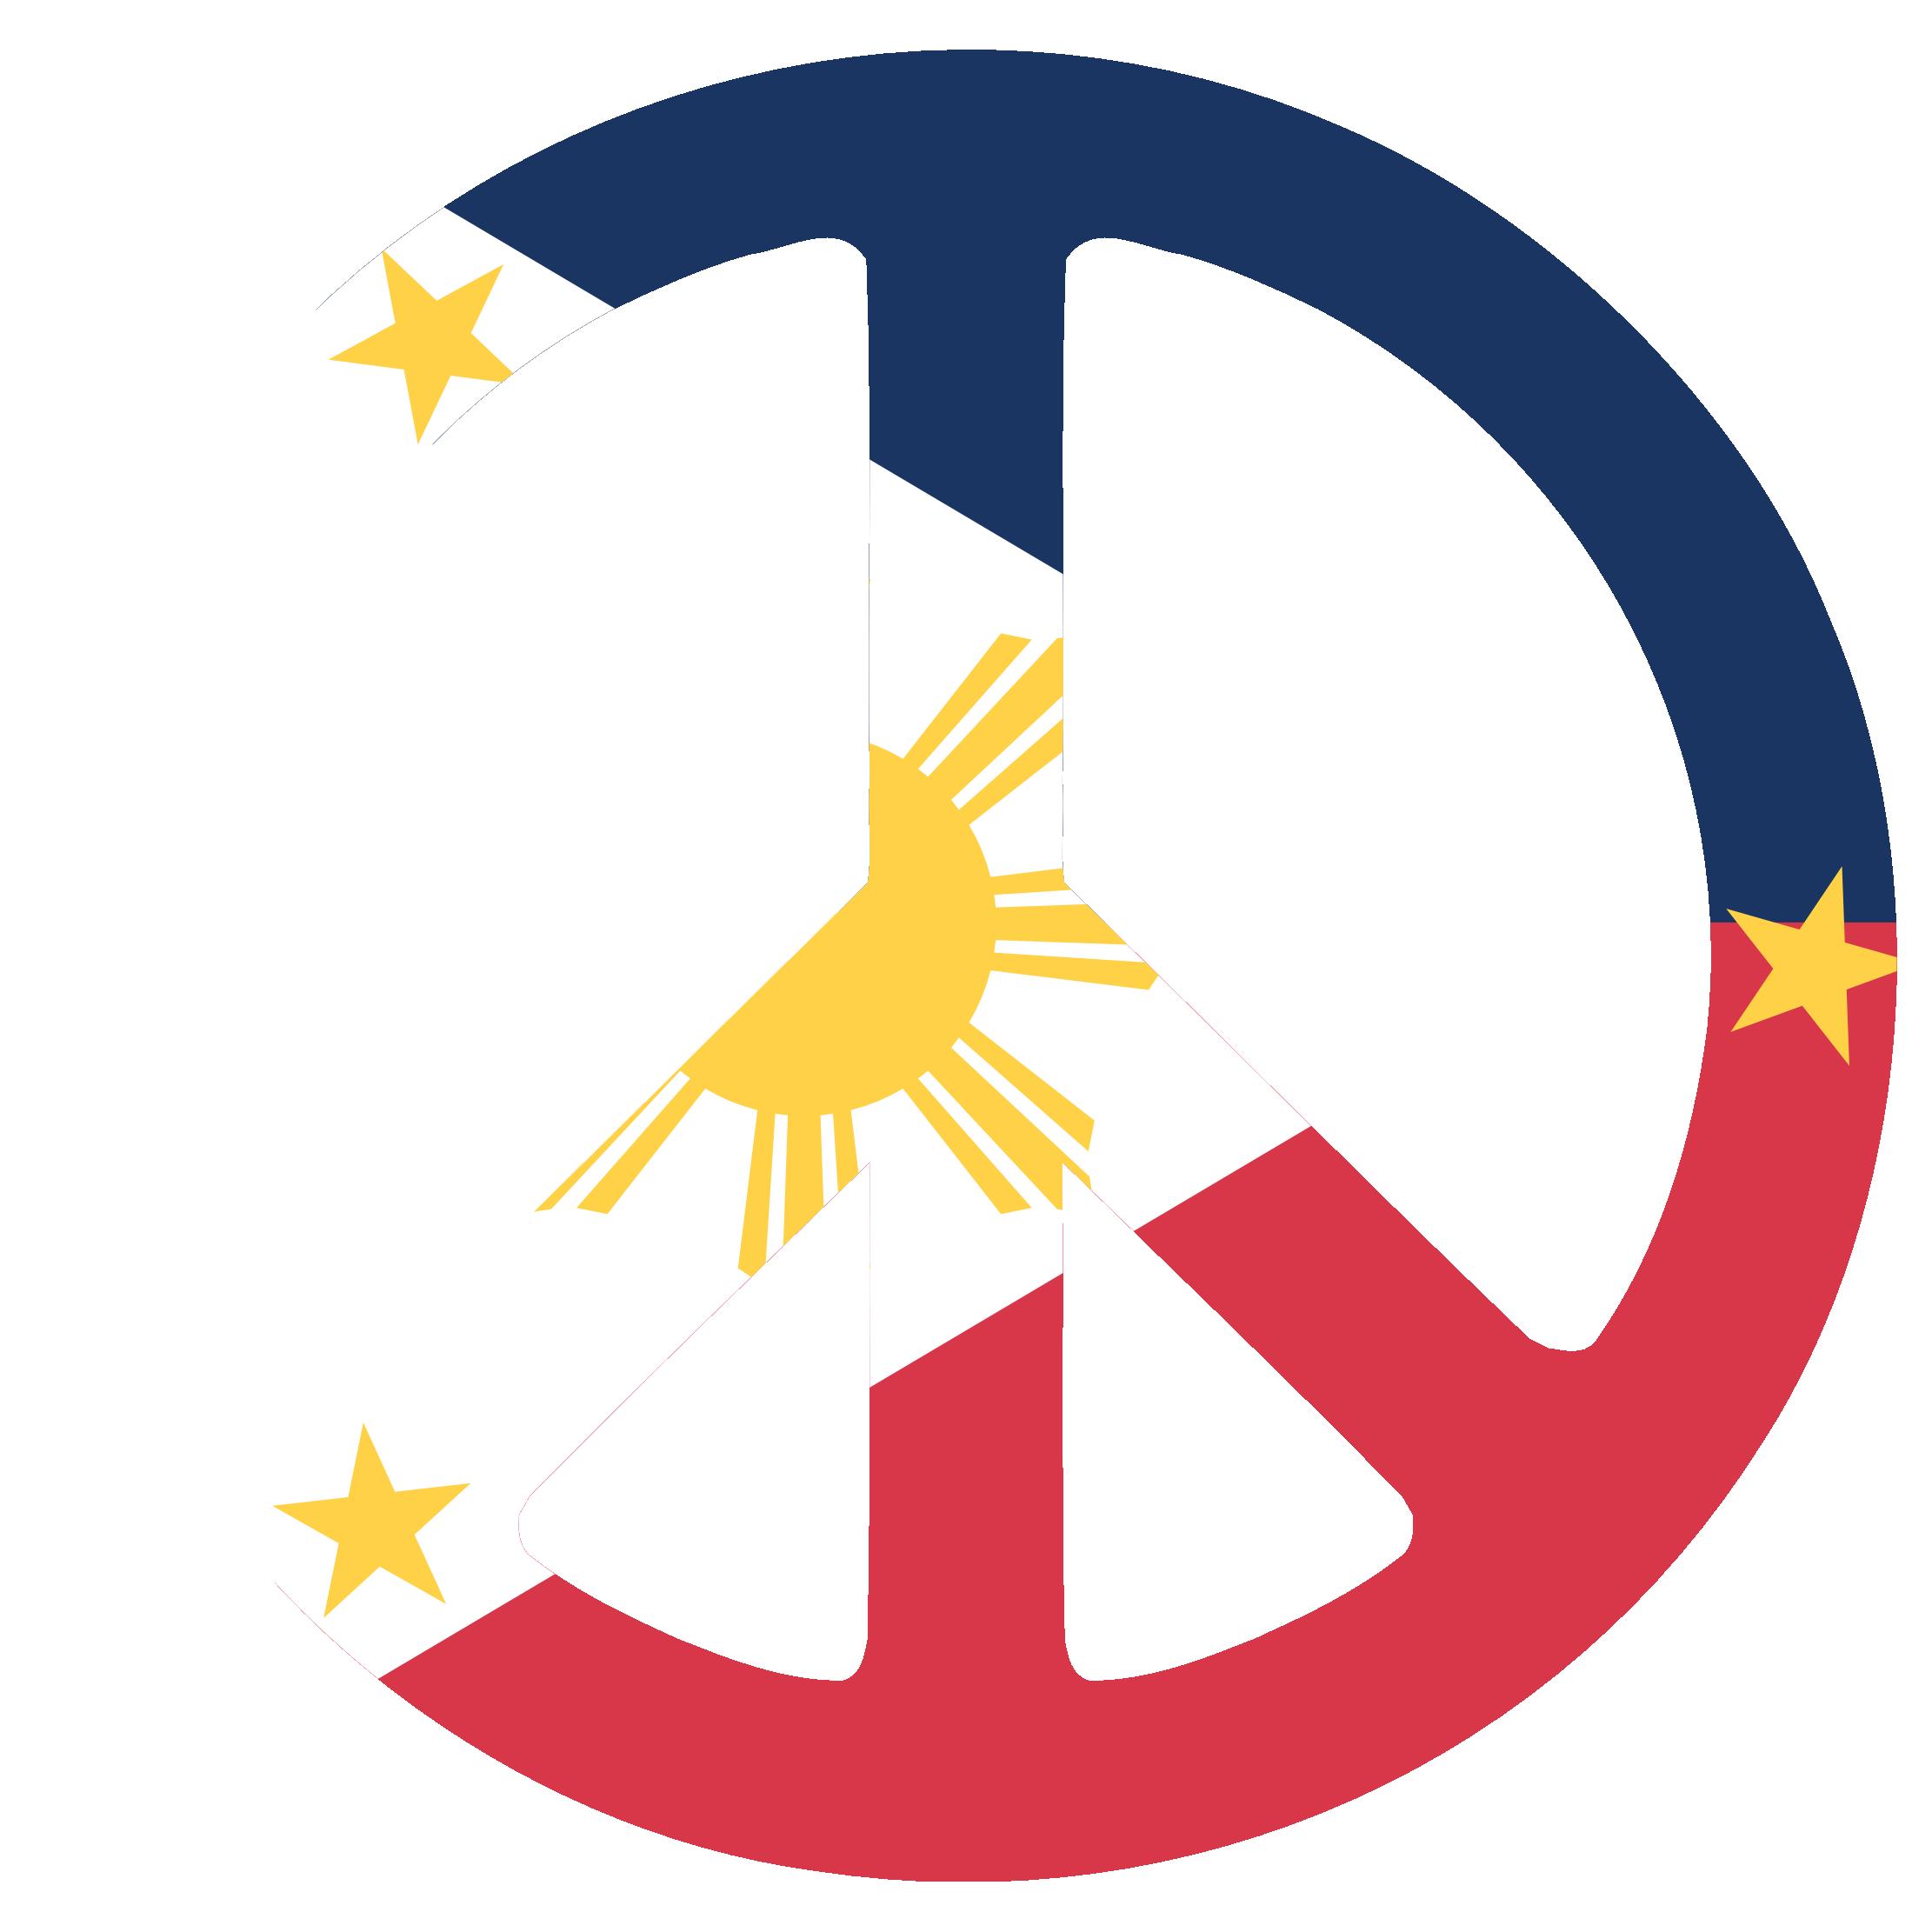 Filipino flag star clipart library nTXybGKTB.png (2222×2222) | Stars n Sun | Pinterest | Filipino library